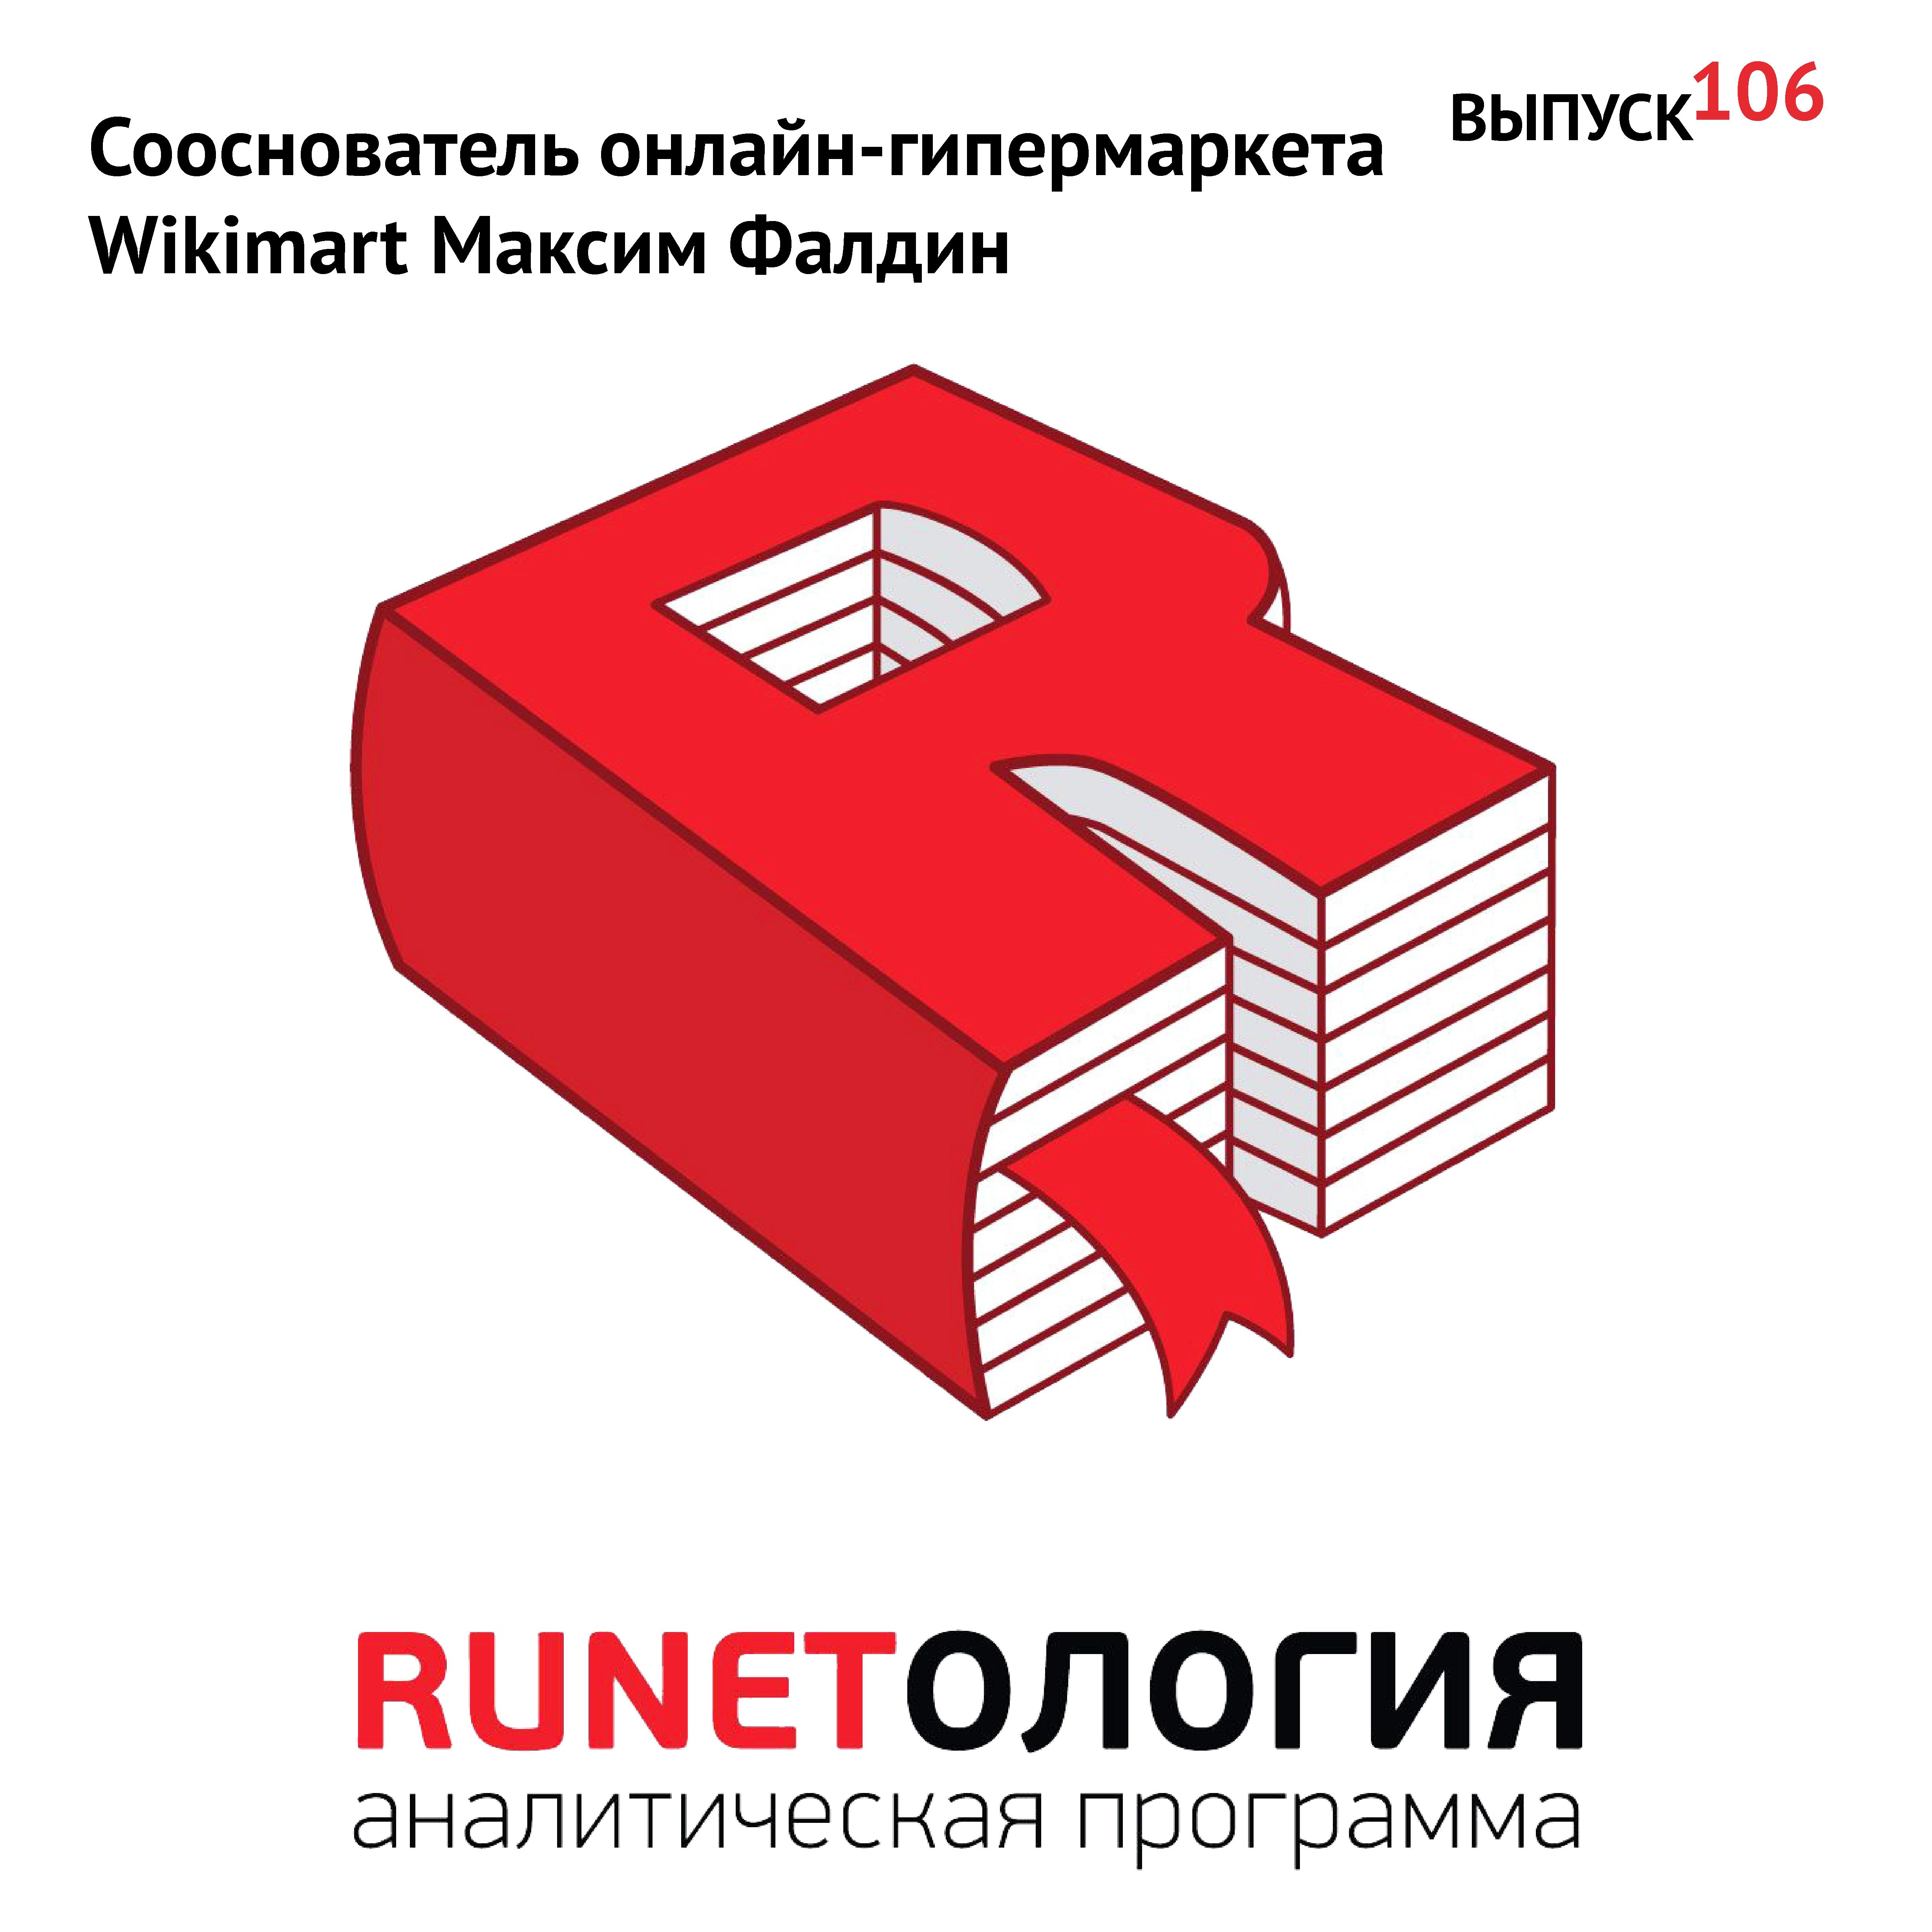 Максим Спиридонов Сооснователь онлайн-гипермаркета Wikimart Максим Фалдин